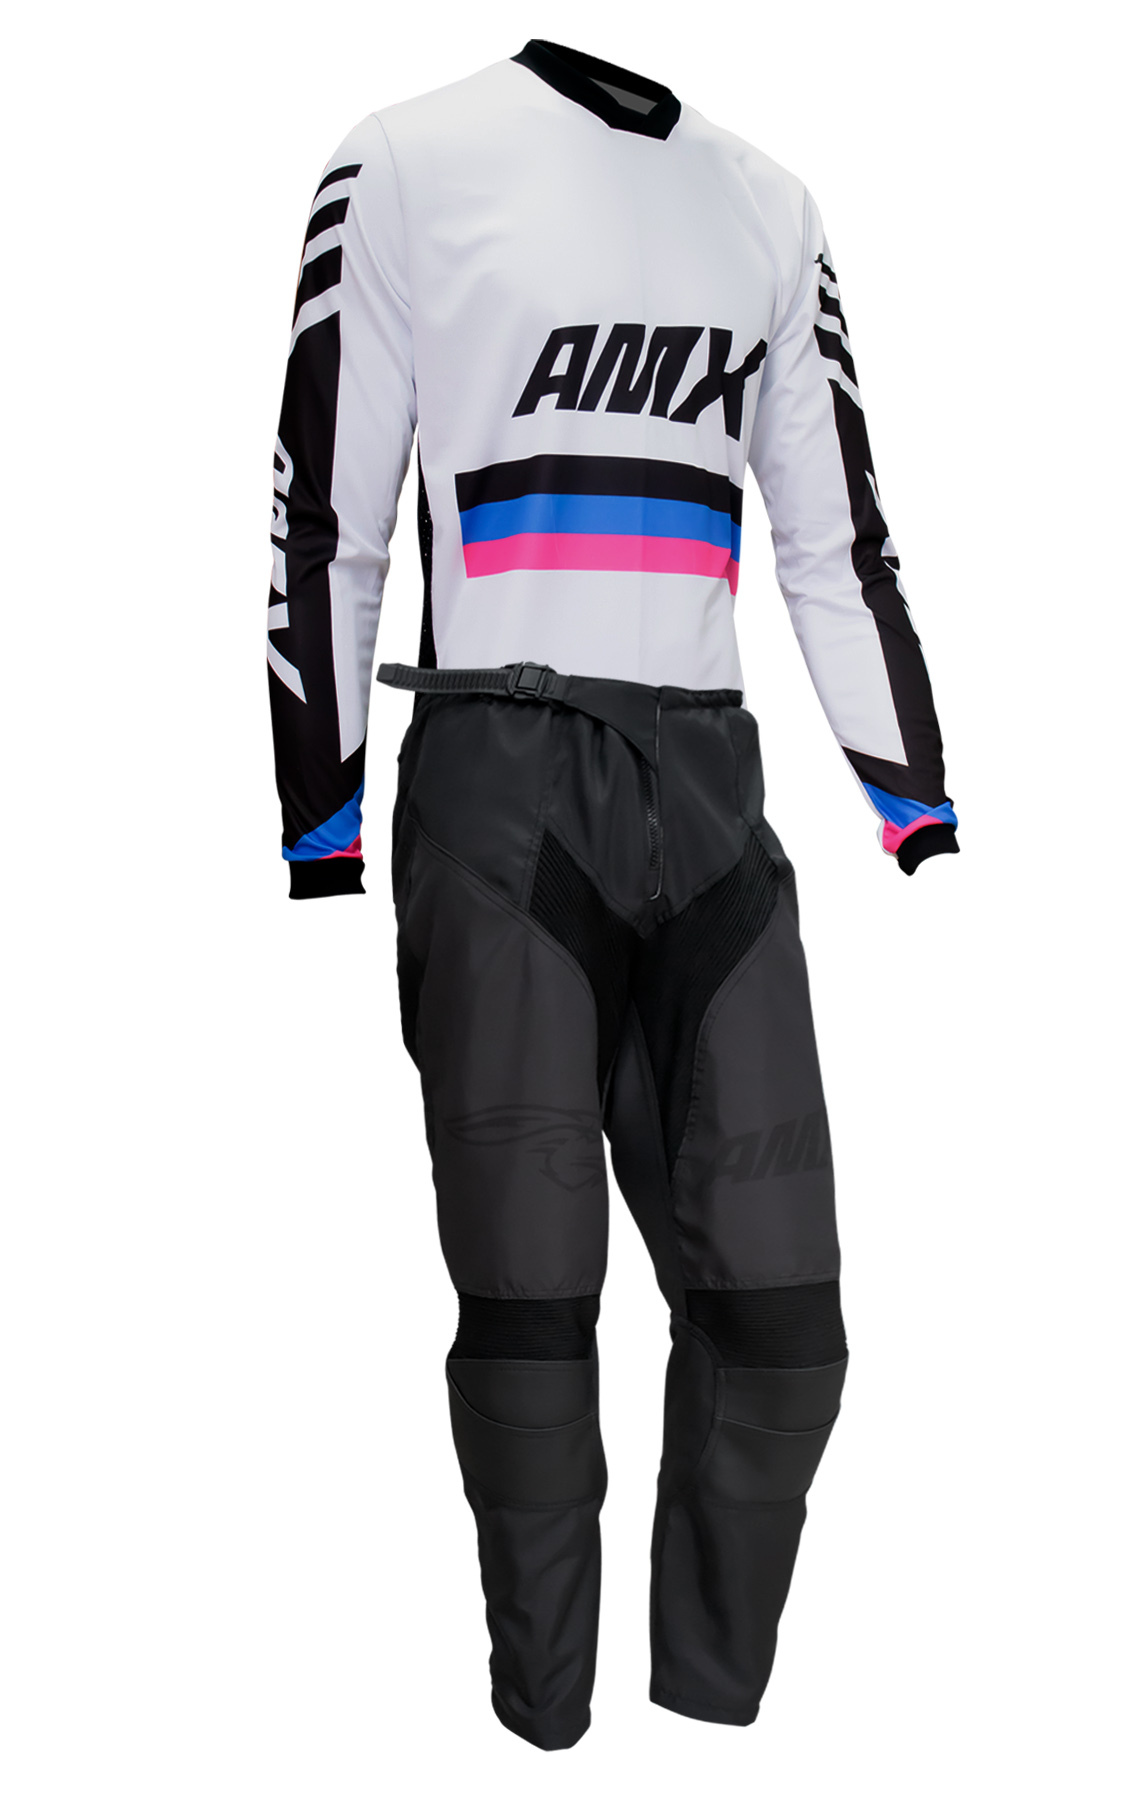 Conjunto Roupa Amx Cross One Branco Preto Calça Camisa Trilha Motocross